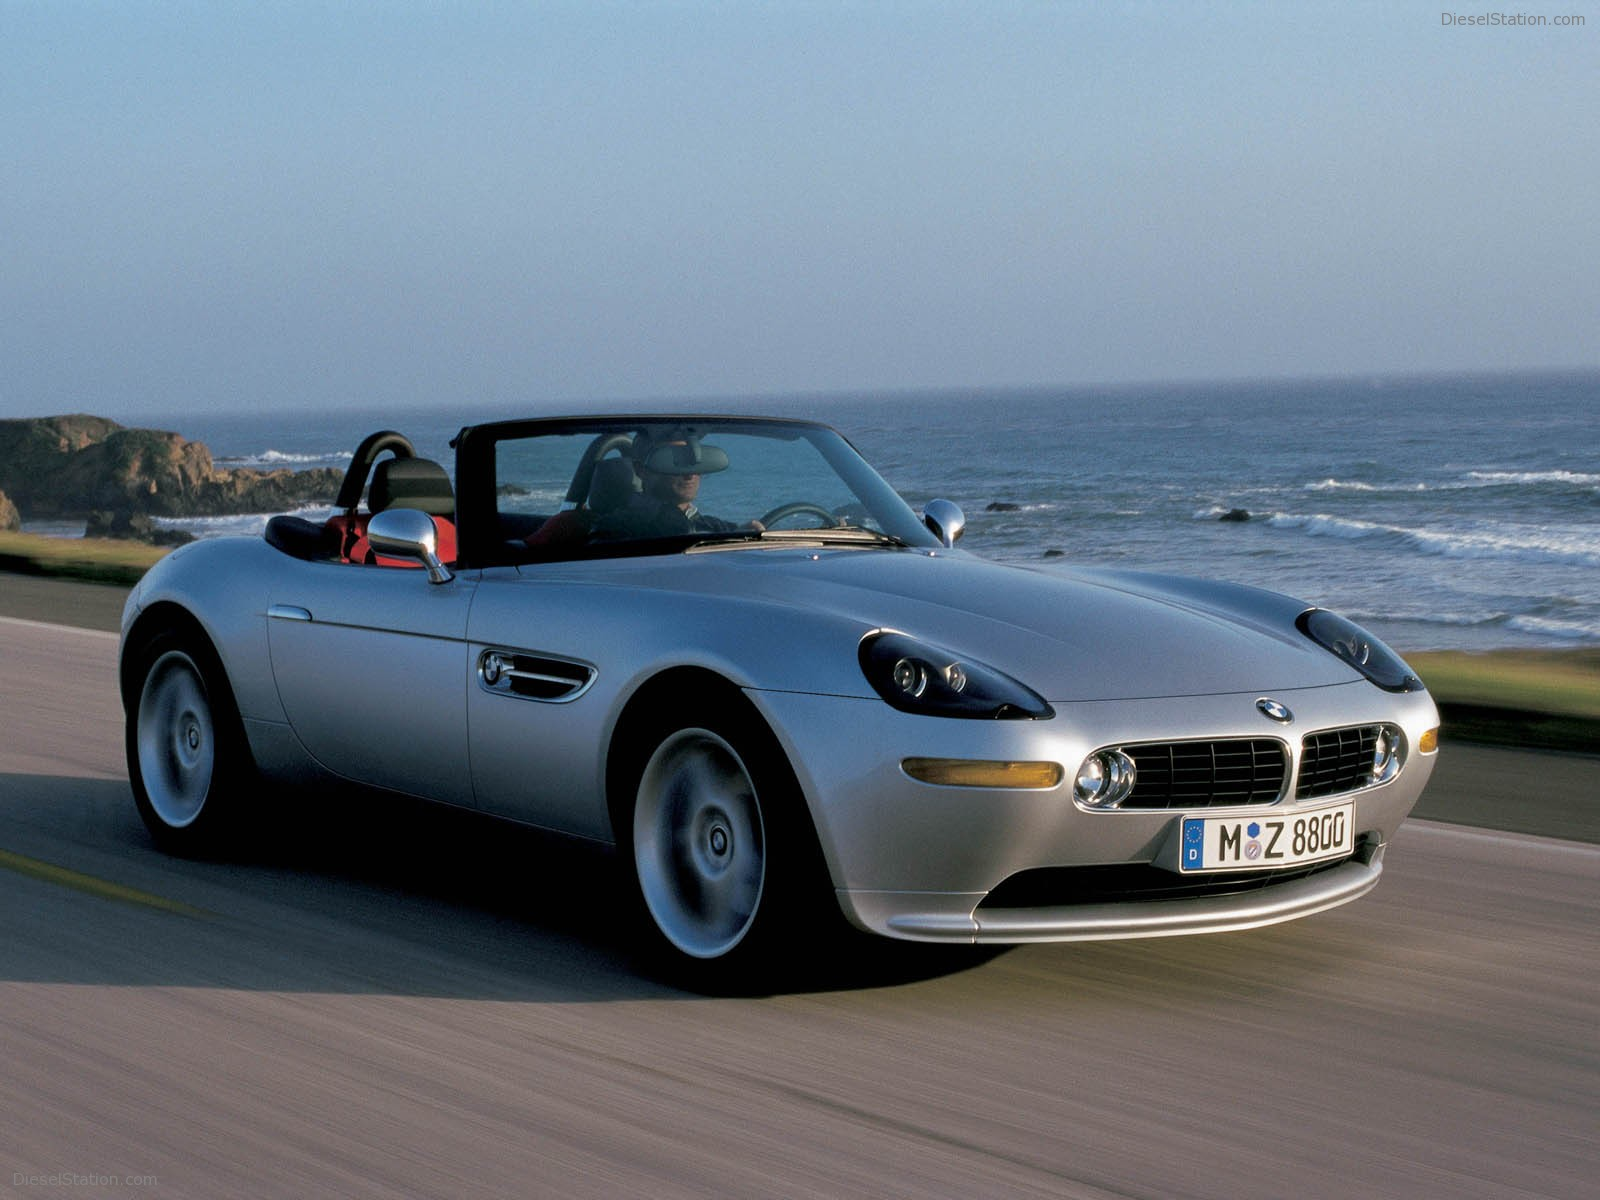 ВСанта-Монике нааукционе Sotheby's продадут редкую BMW